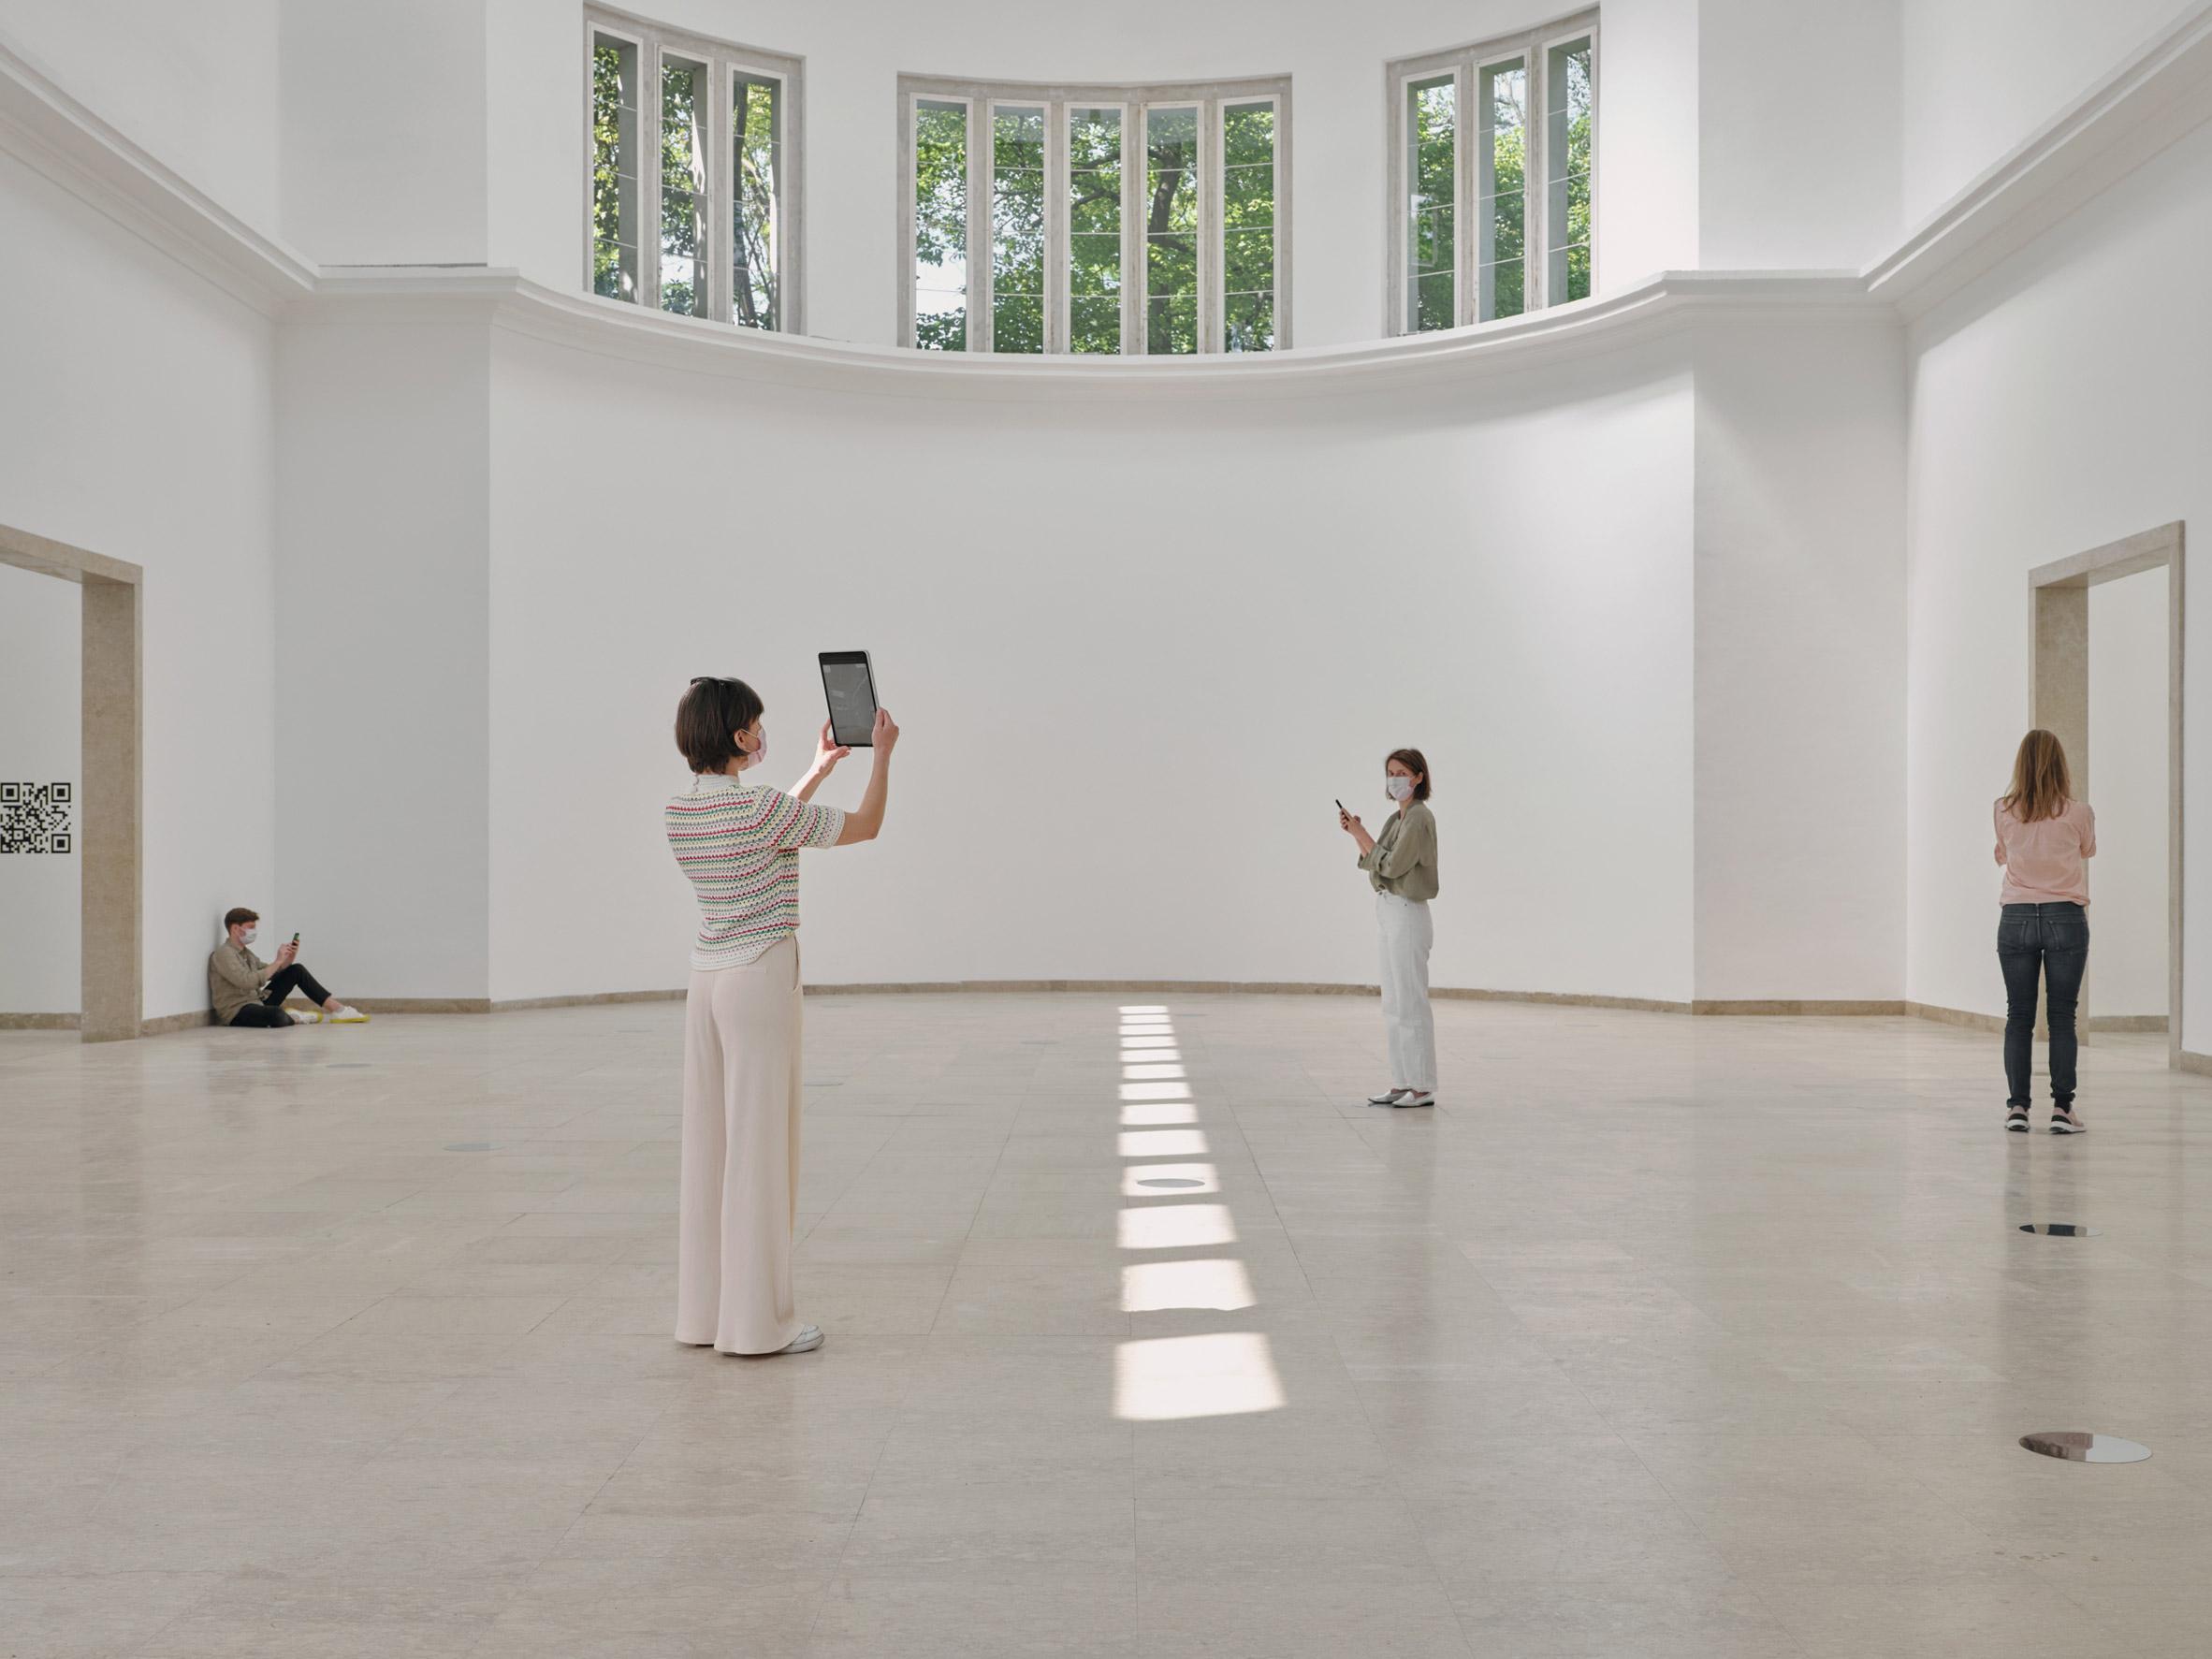 The German Pavilion at the Venice Architecture Biennale